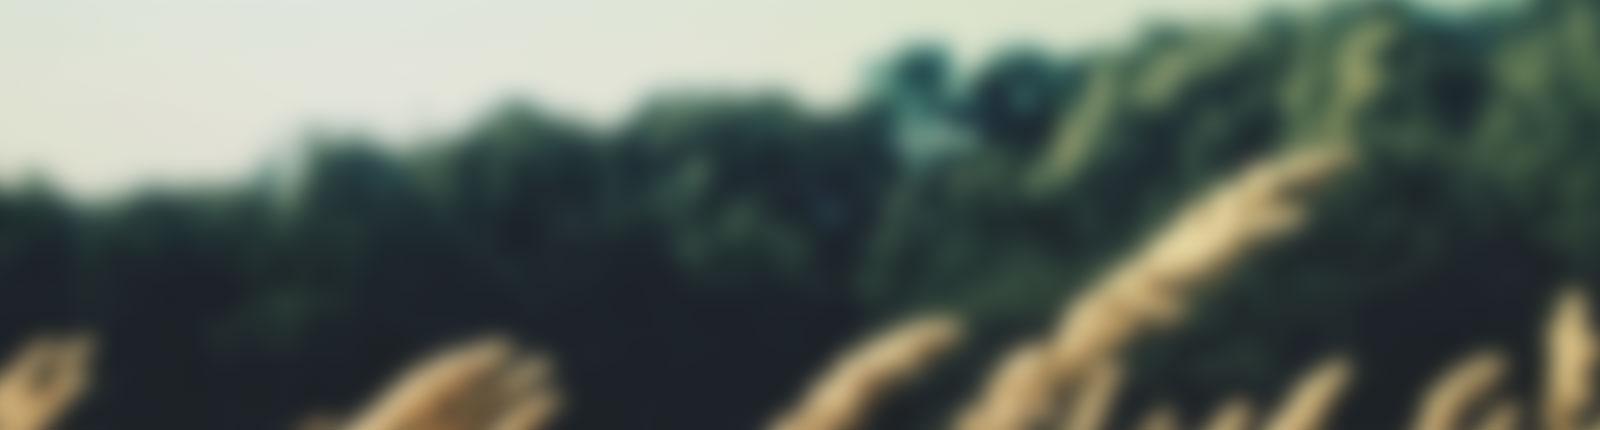 background2